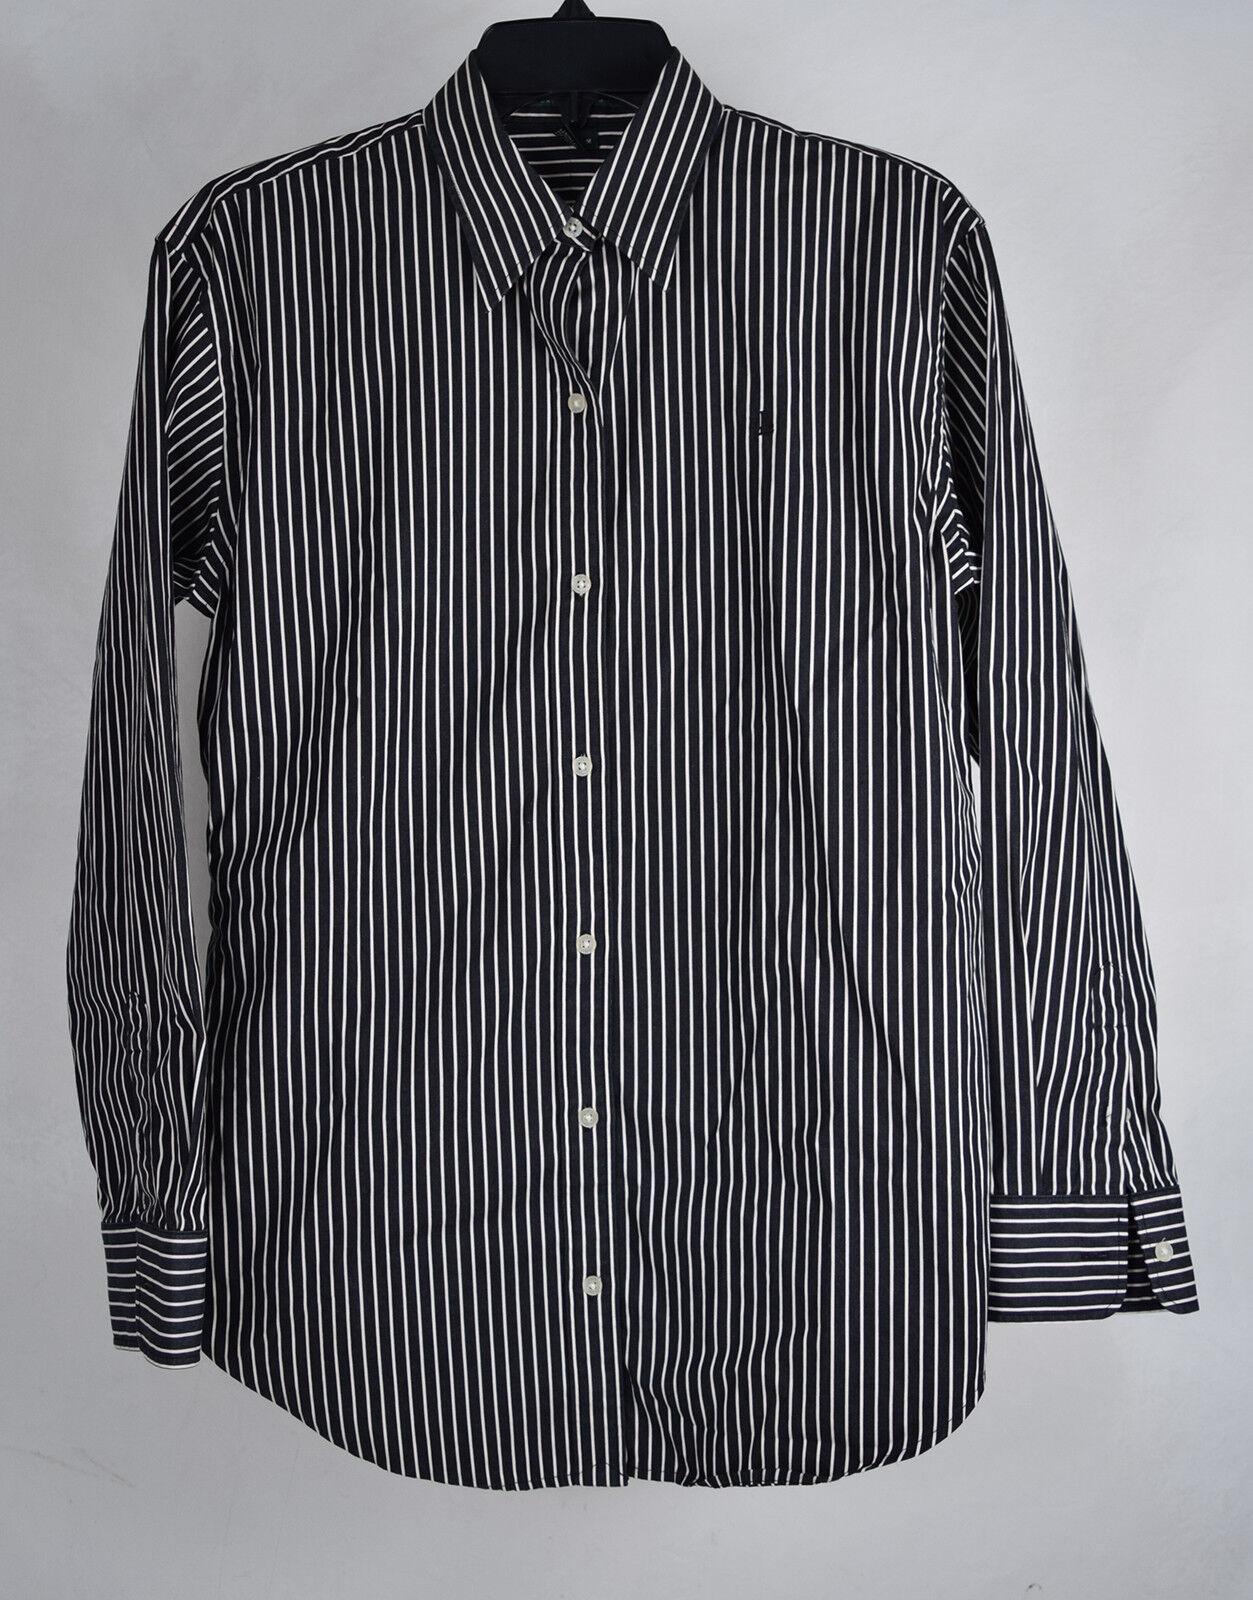 Lauren Ralph Lauren Dress Shirt Stripe schwarz Weiß LS Top M damen